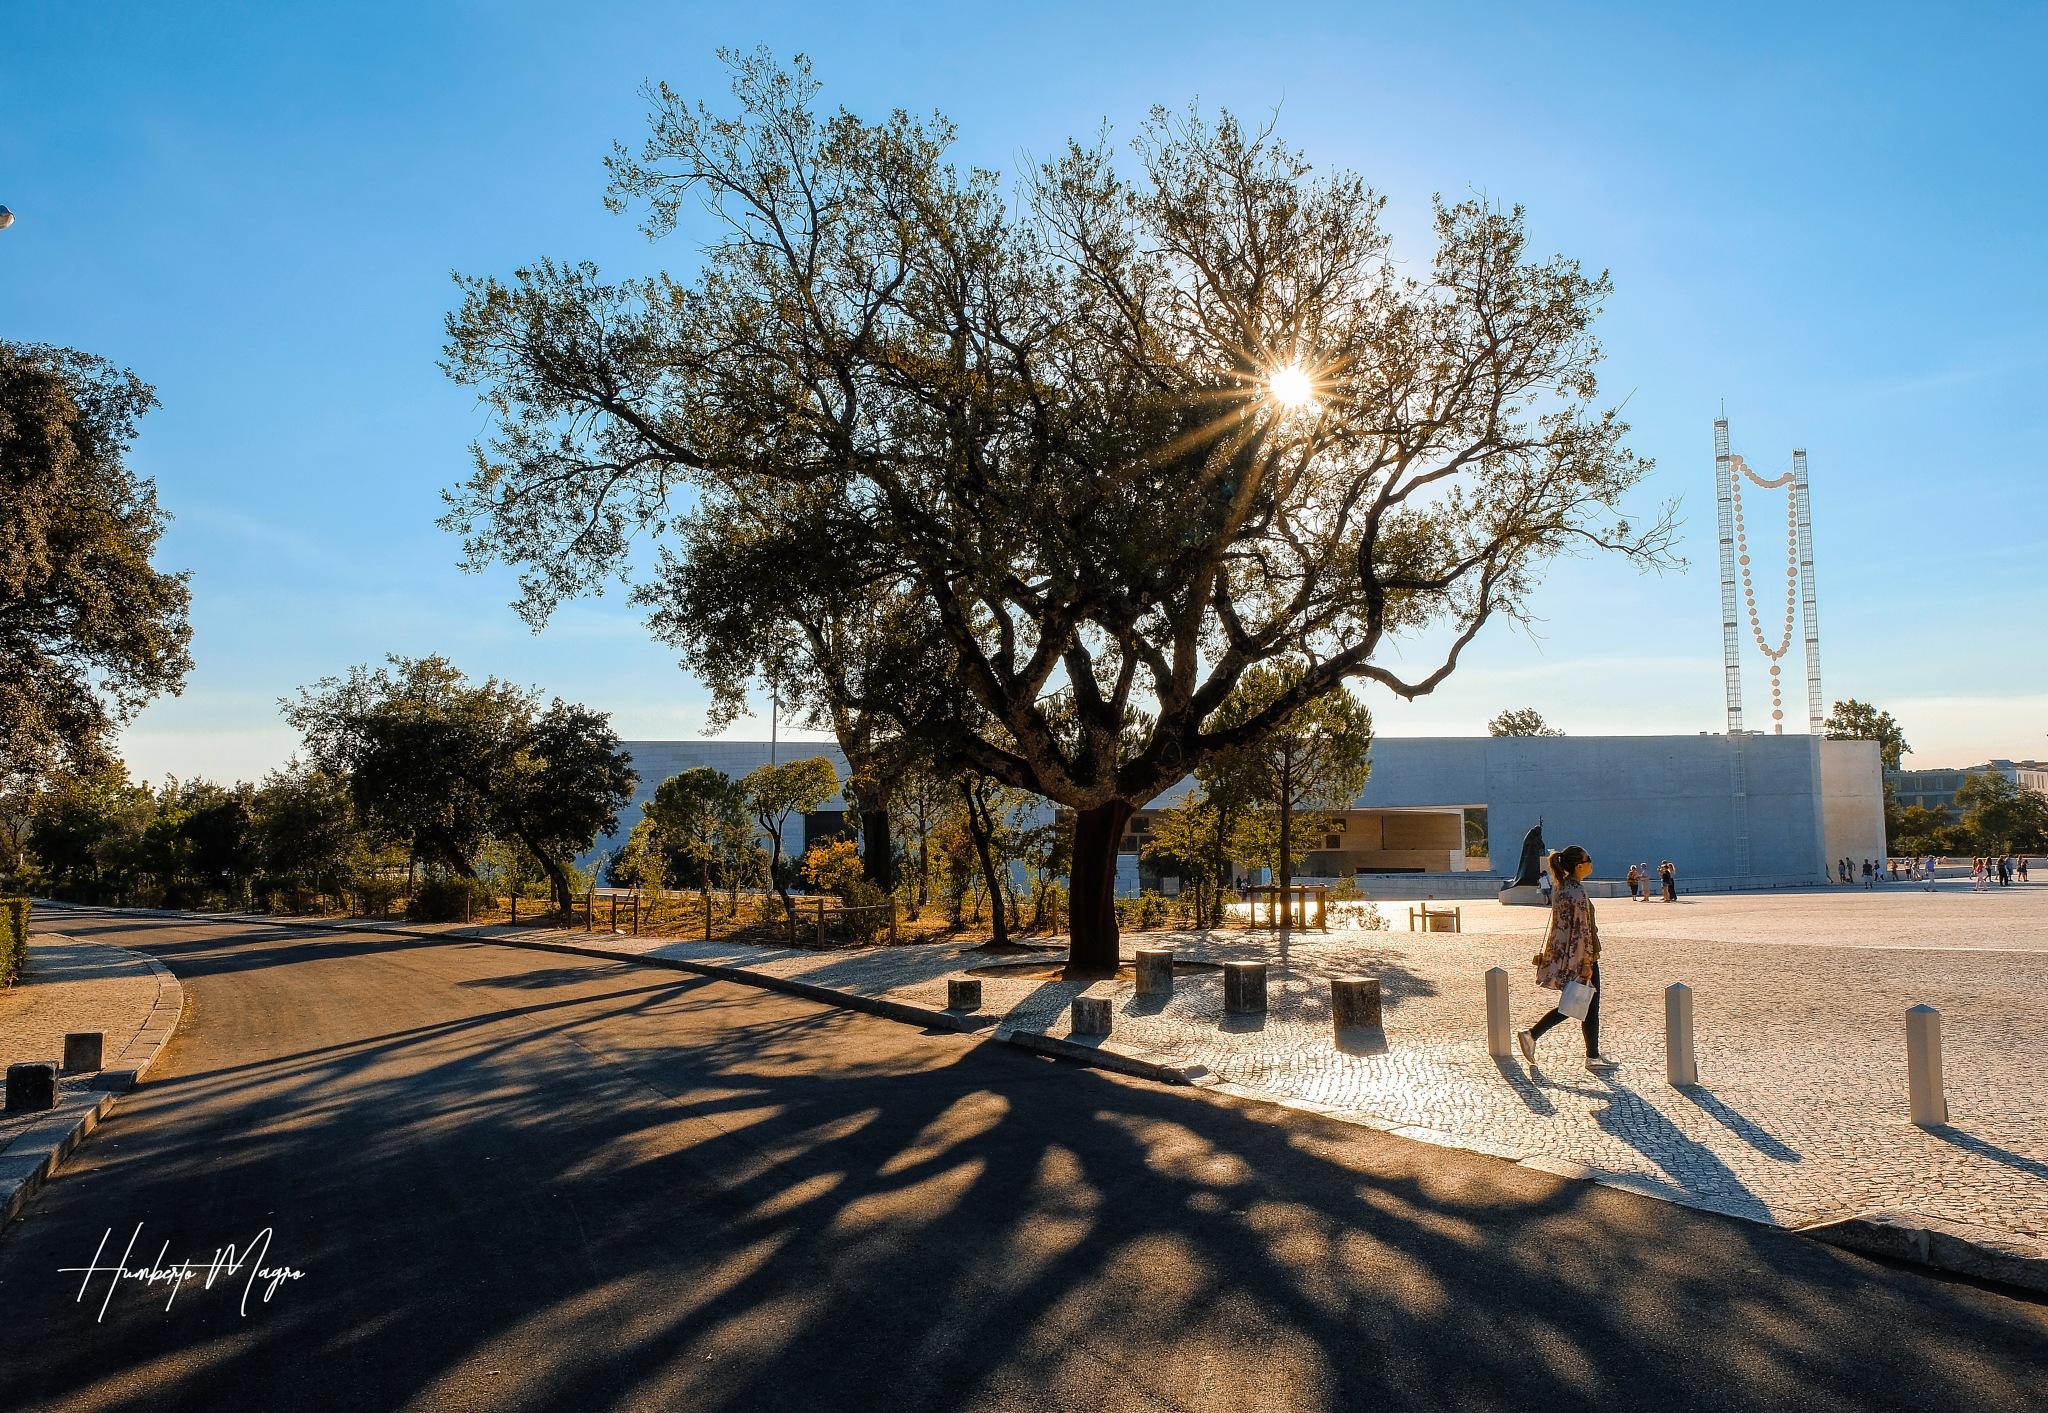 tree of life by Humberto Magro